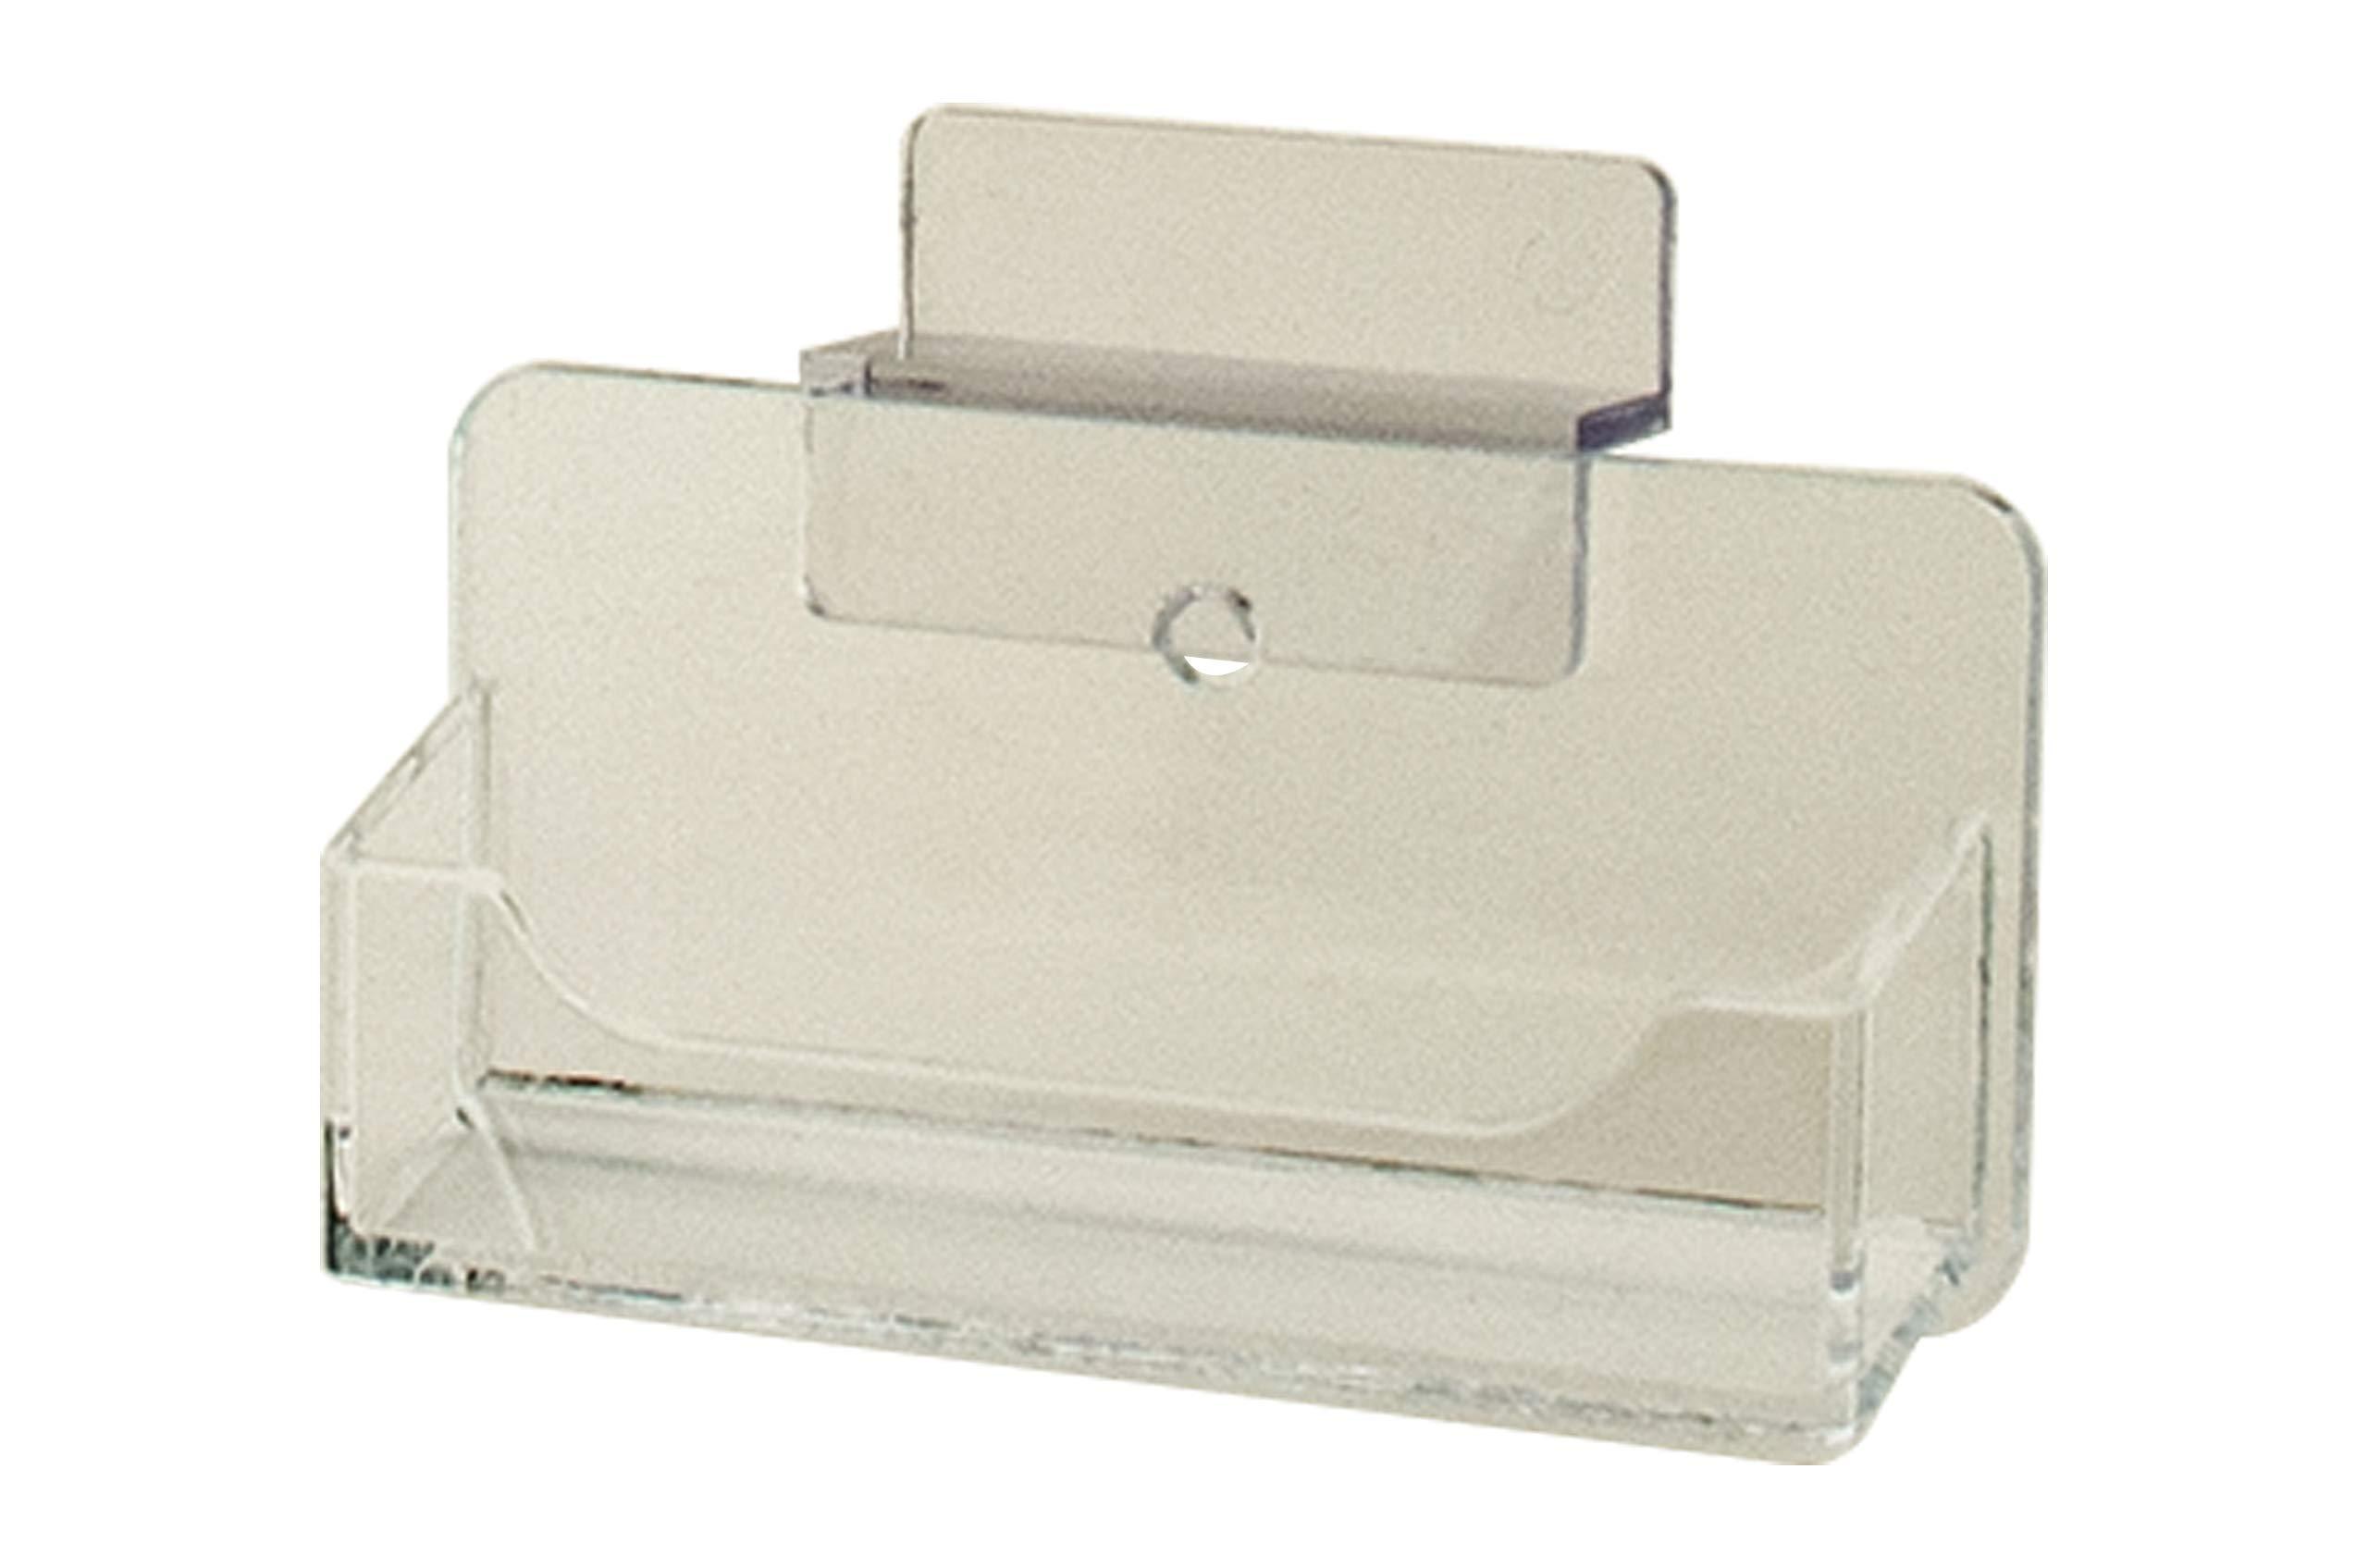 Marketing Holders Slatwall Business Card Holder Display Rack Desk Stand Clear Qty 4